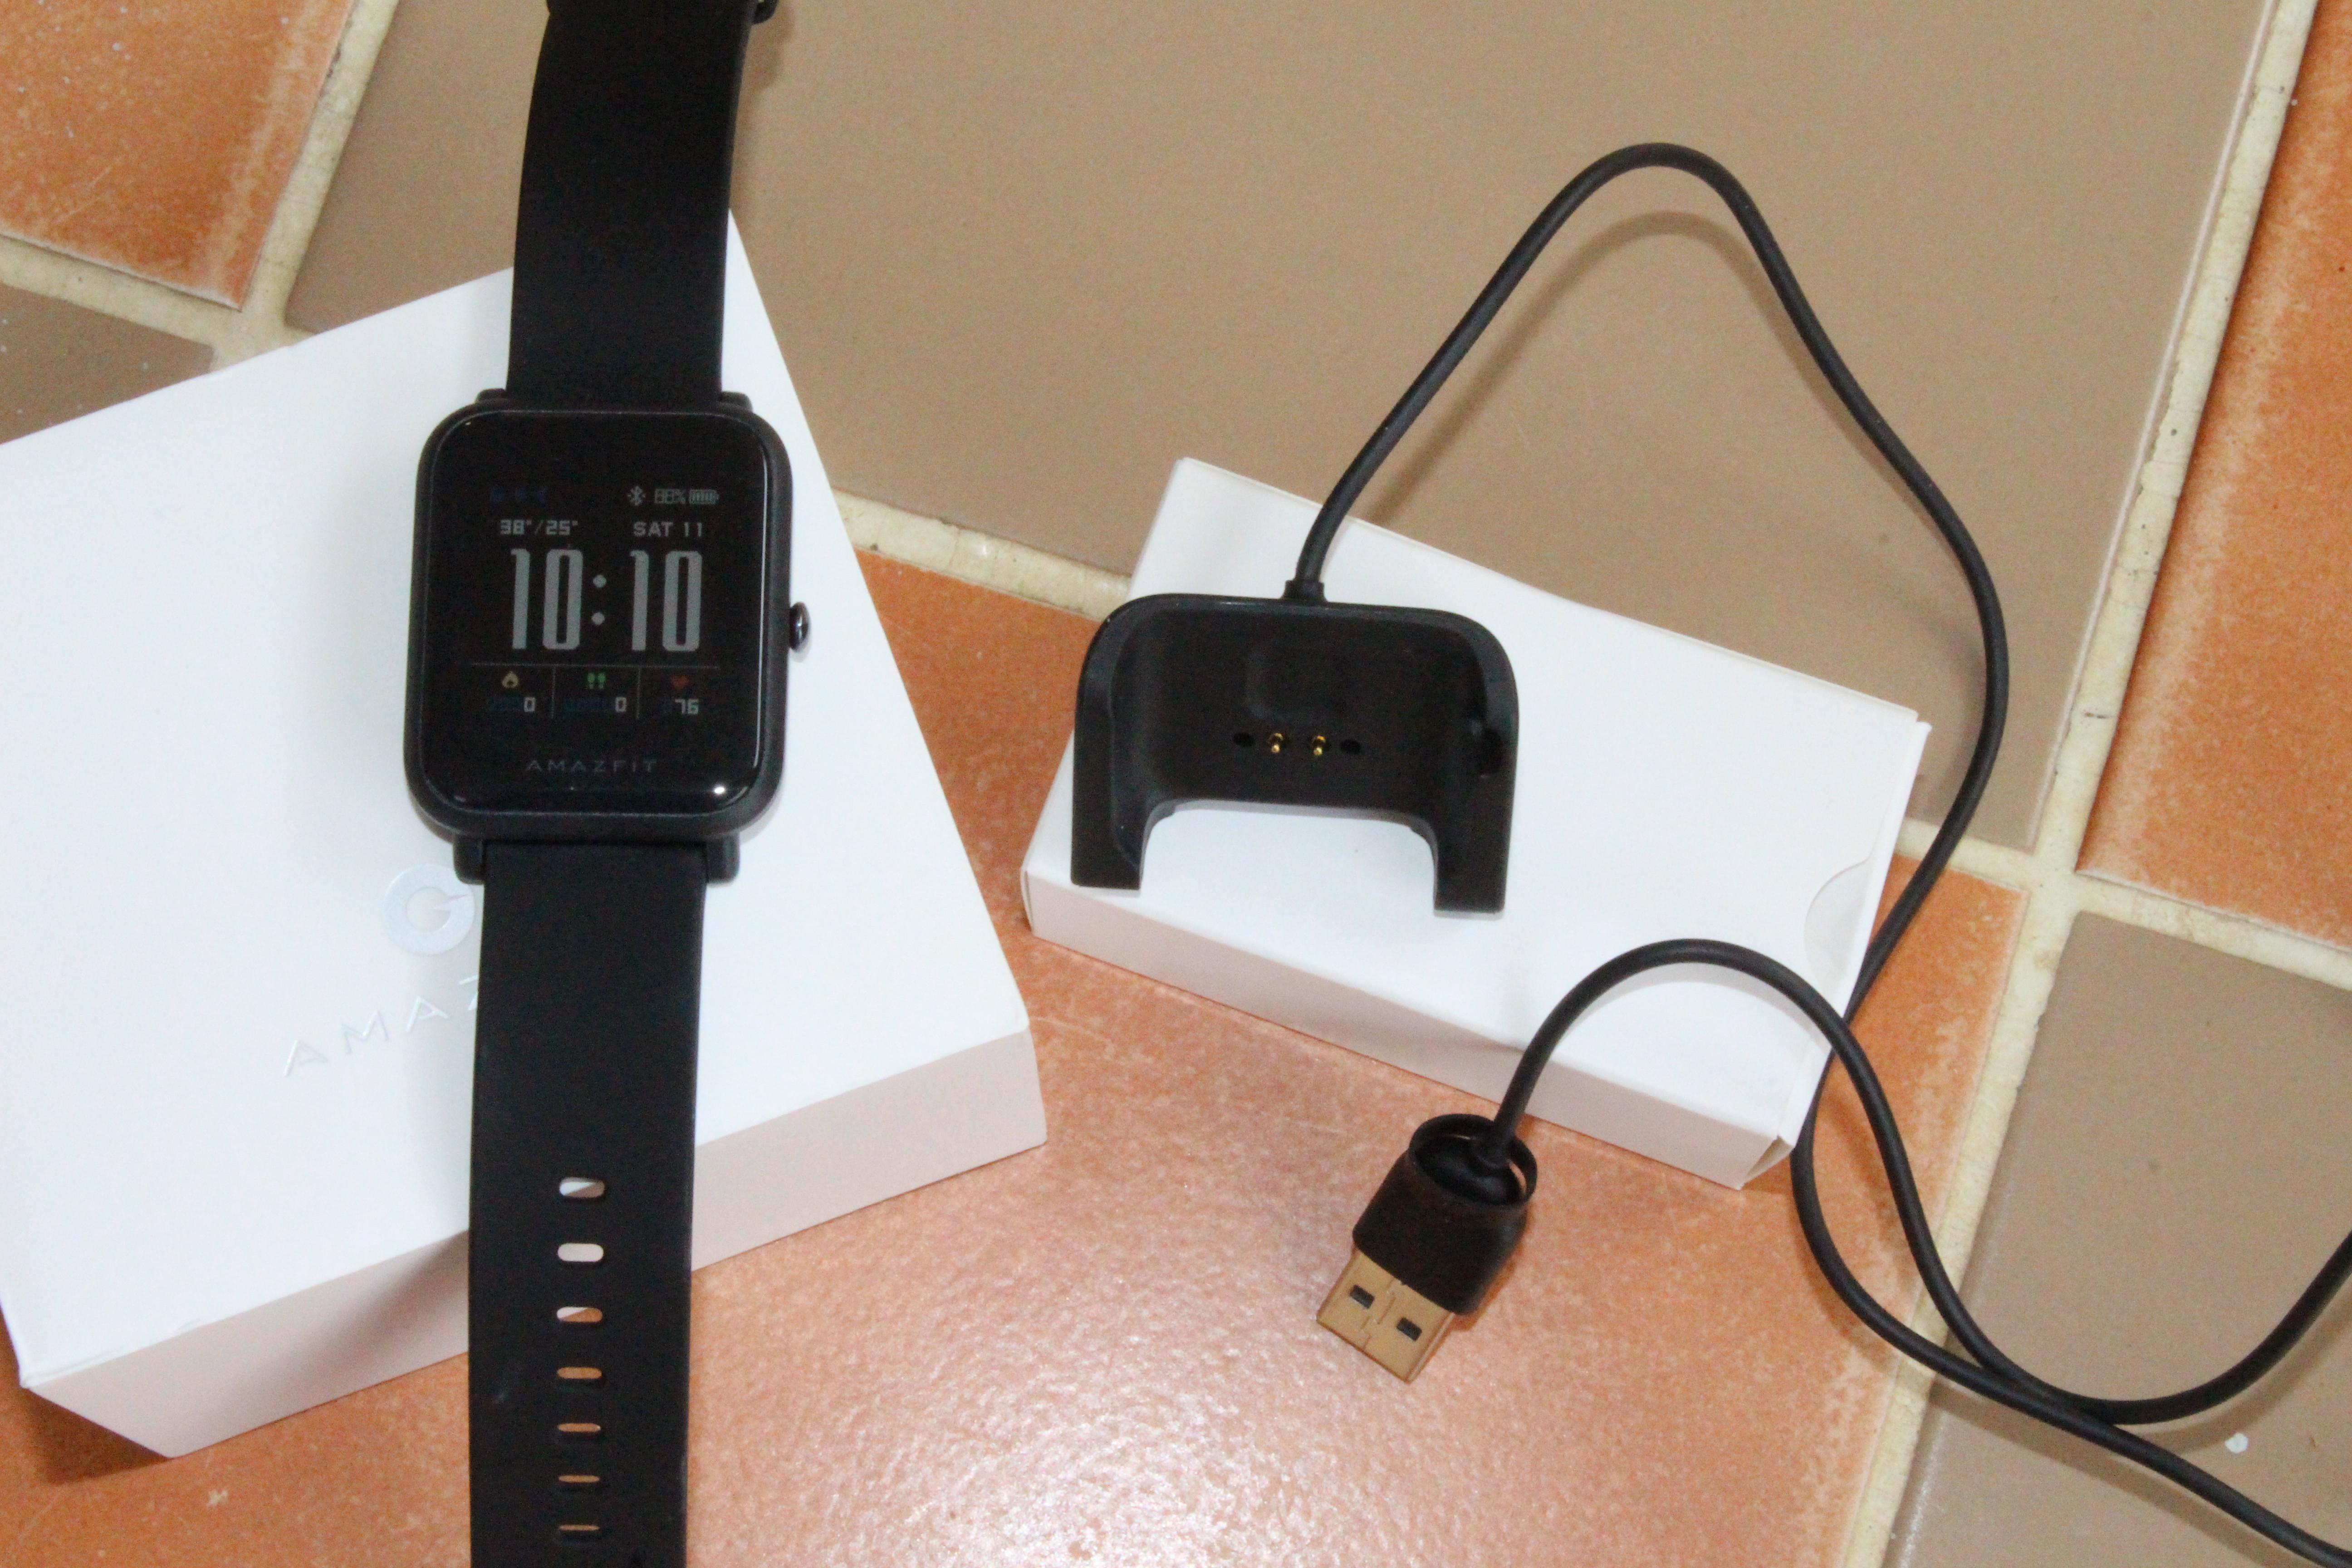 Customize Amazfit Bip Smartwatch - Thai Language and Mickey Mouse